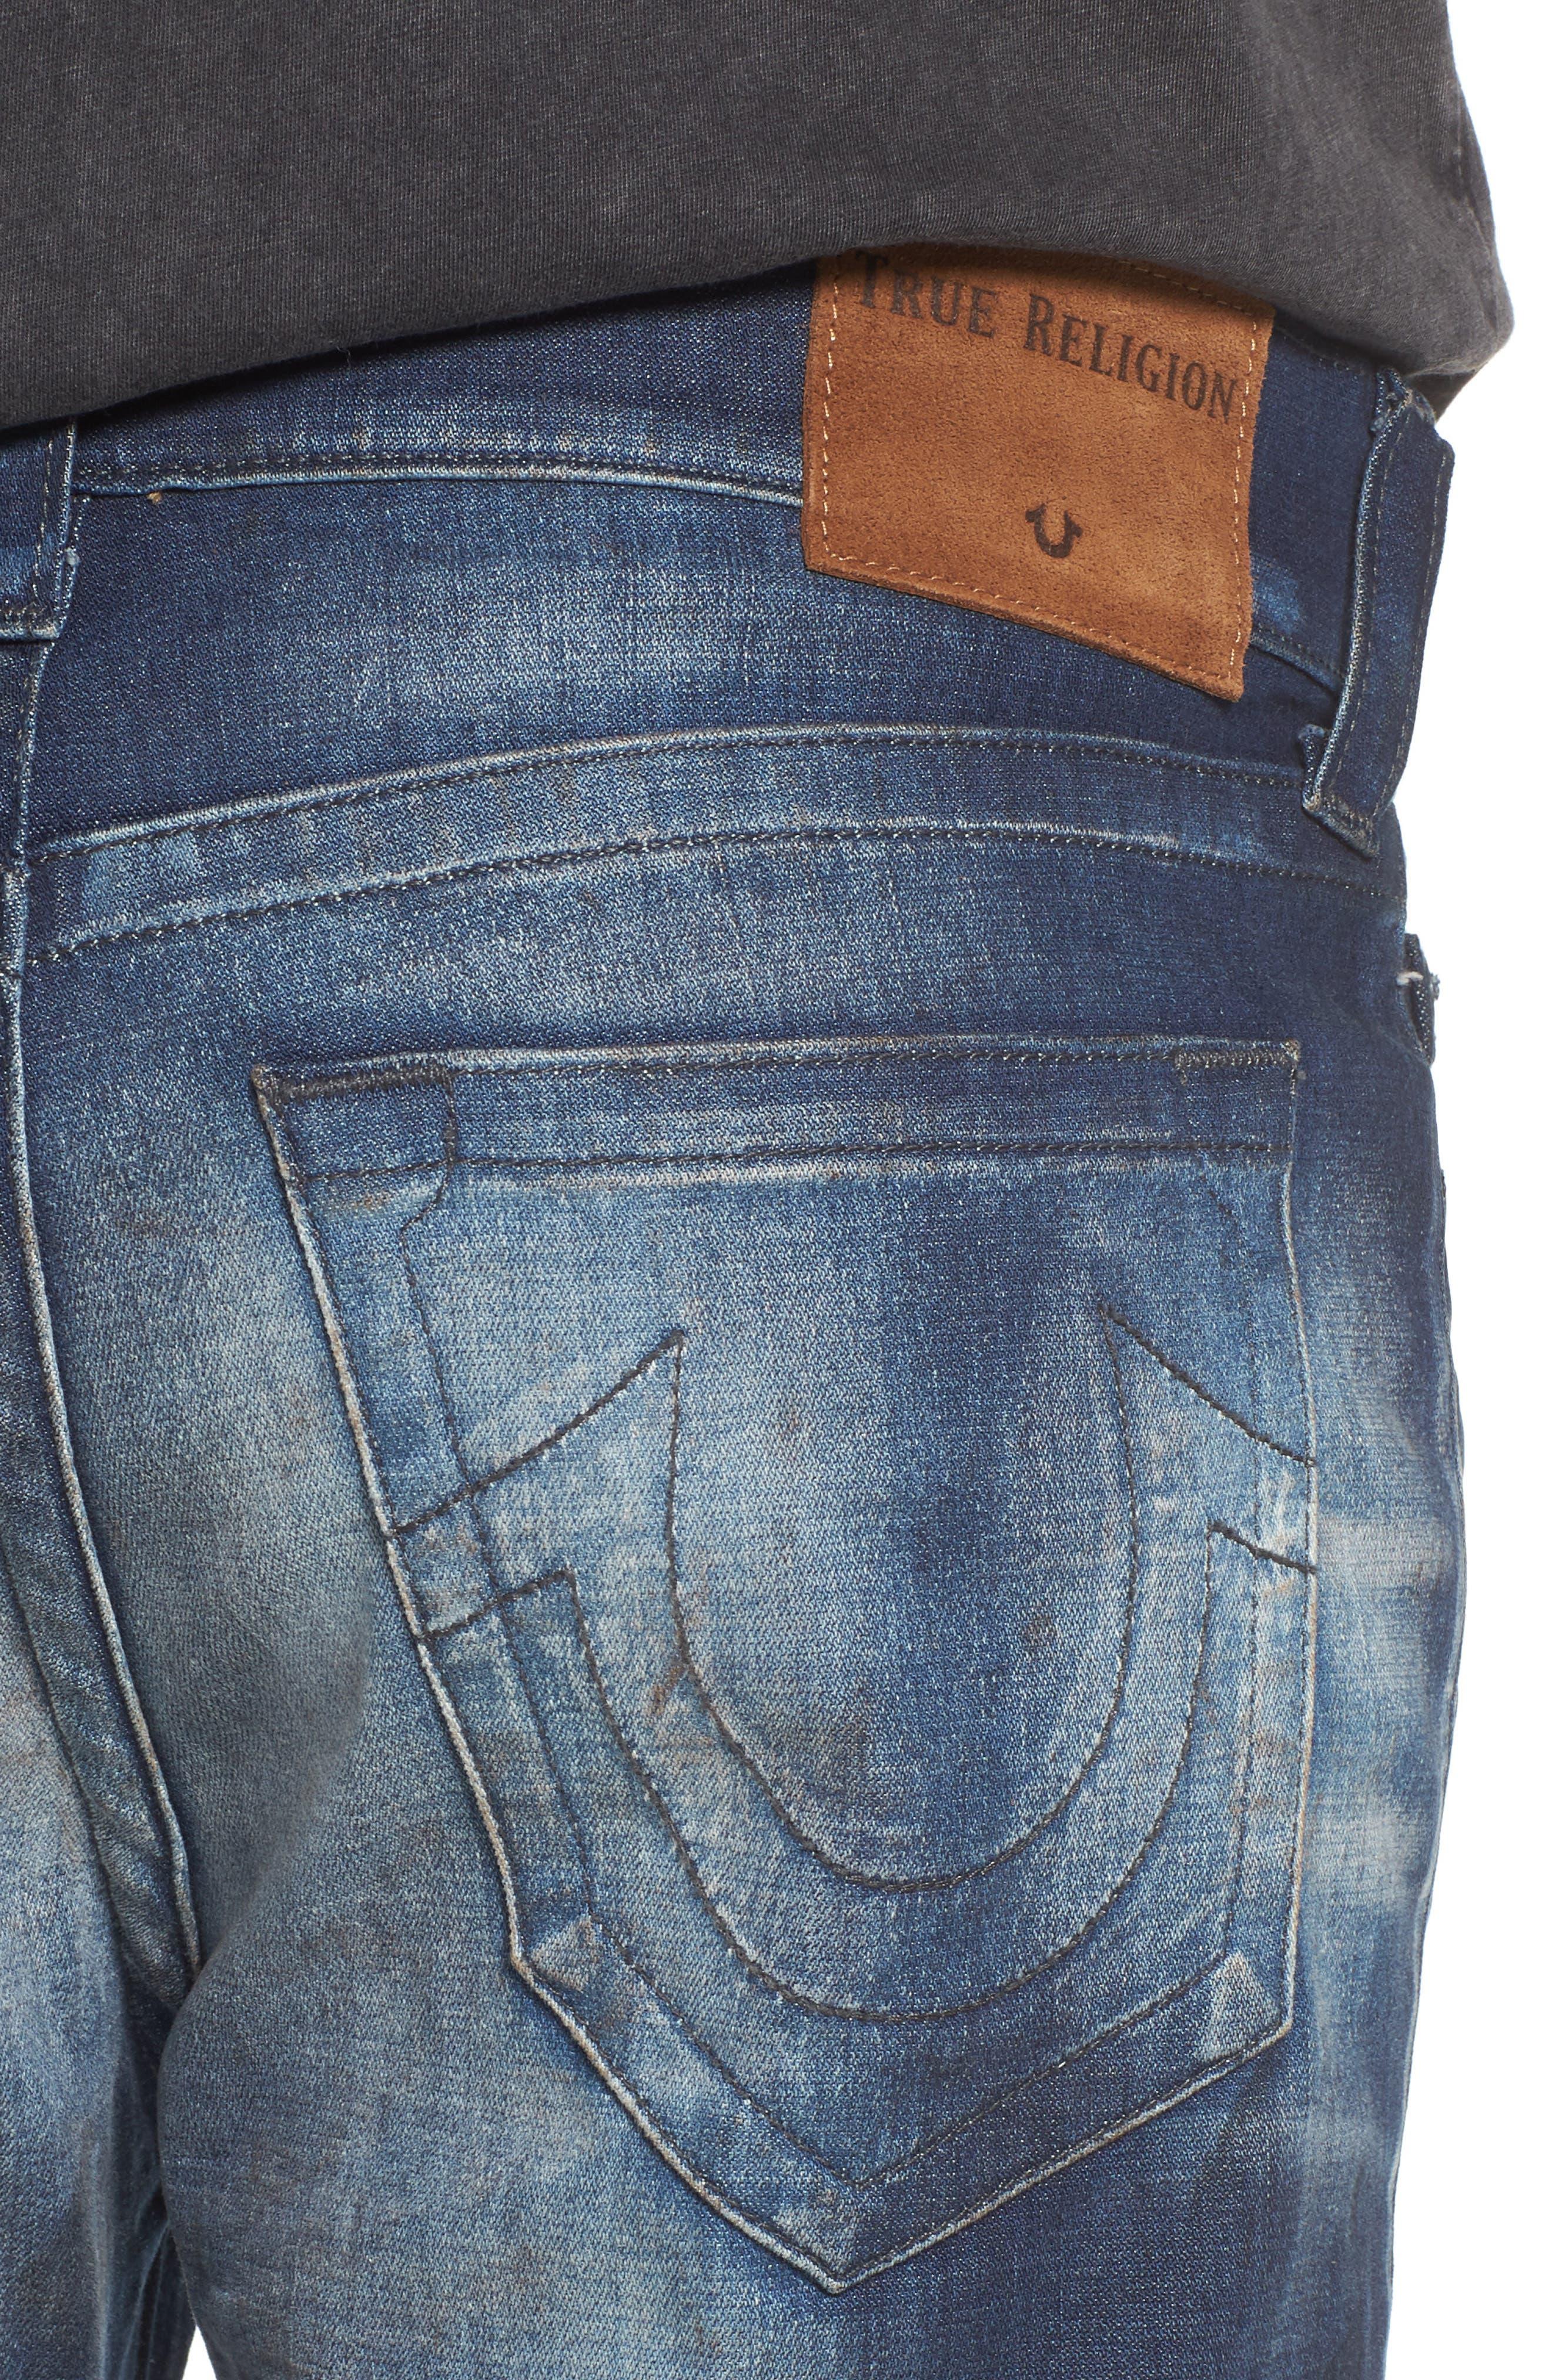 Rocco Skinny Fit Jeans,                             Alternate thumbnail 4, color,                             Loft Edge